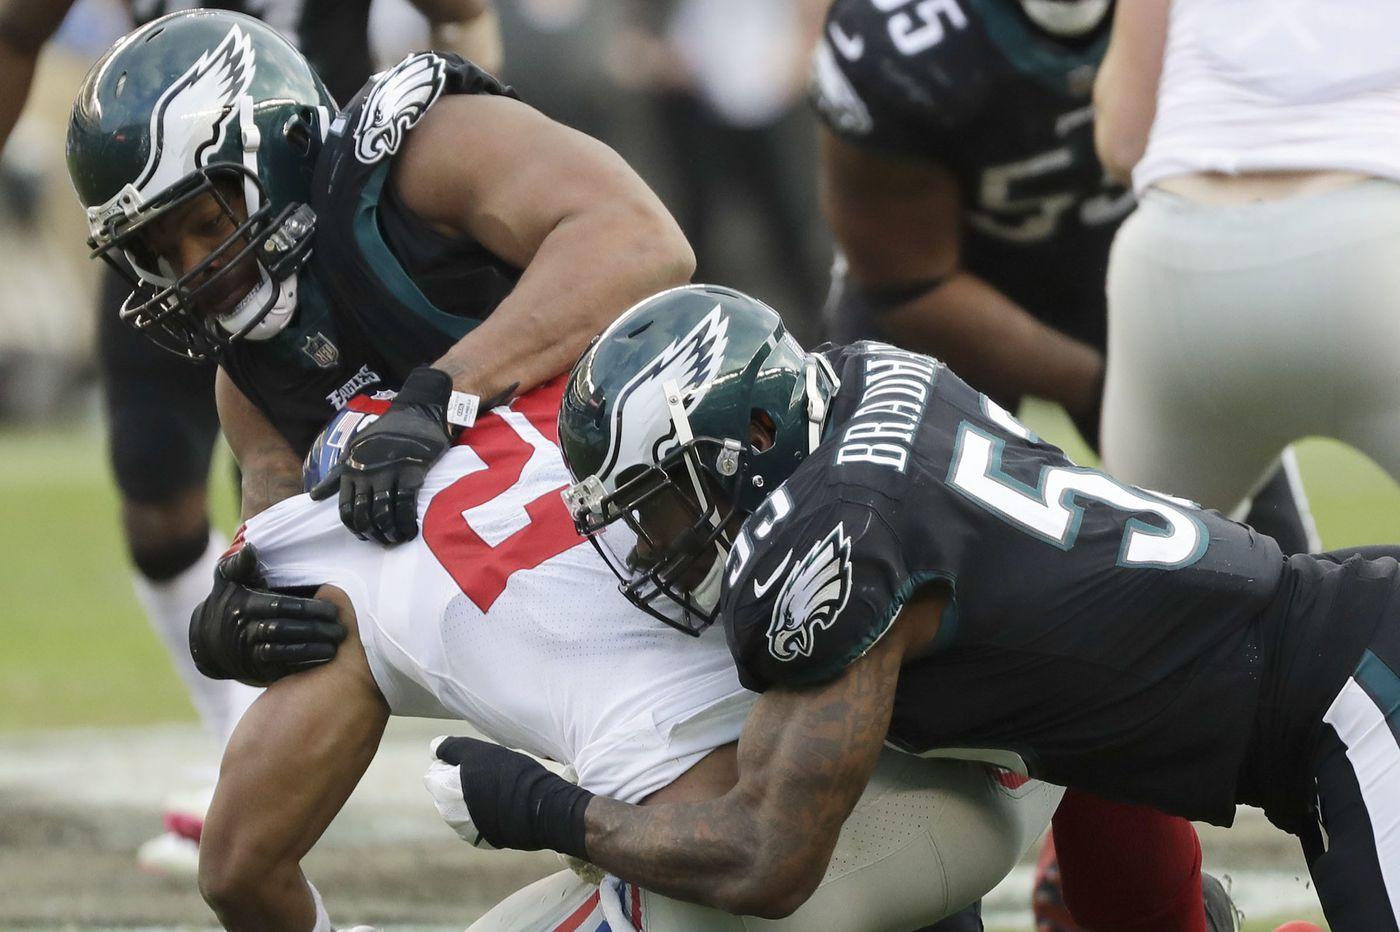 Eagles' Nigel Bradham has a broken thumb but intends to play against Washington